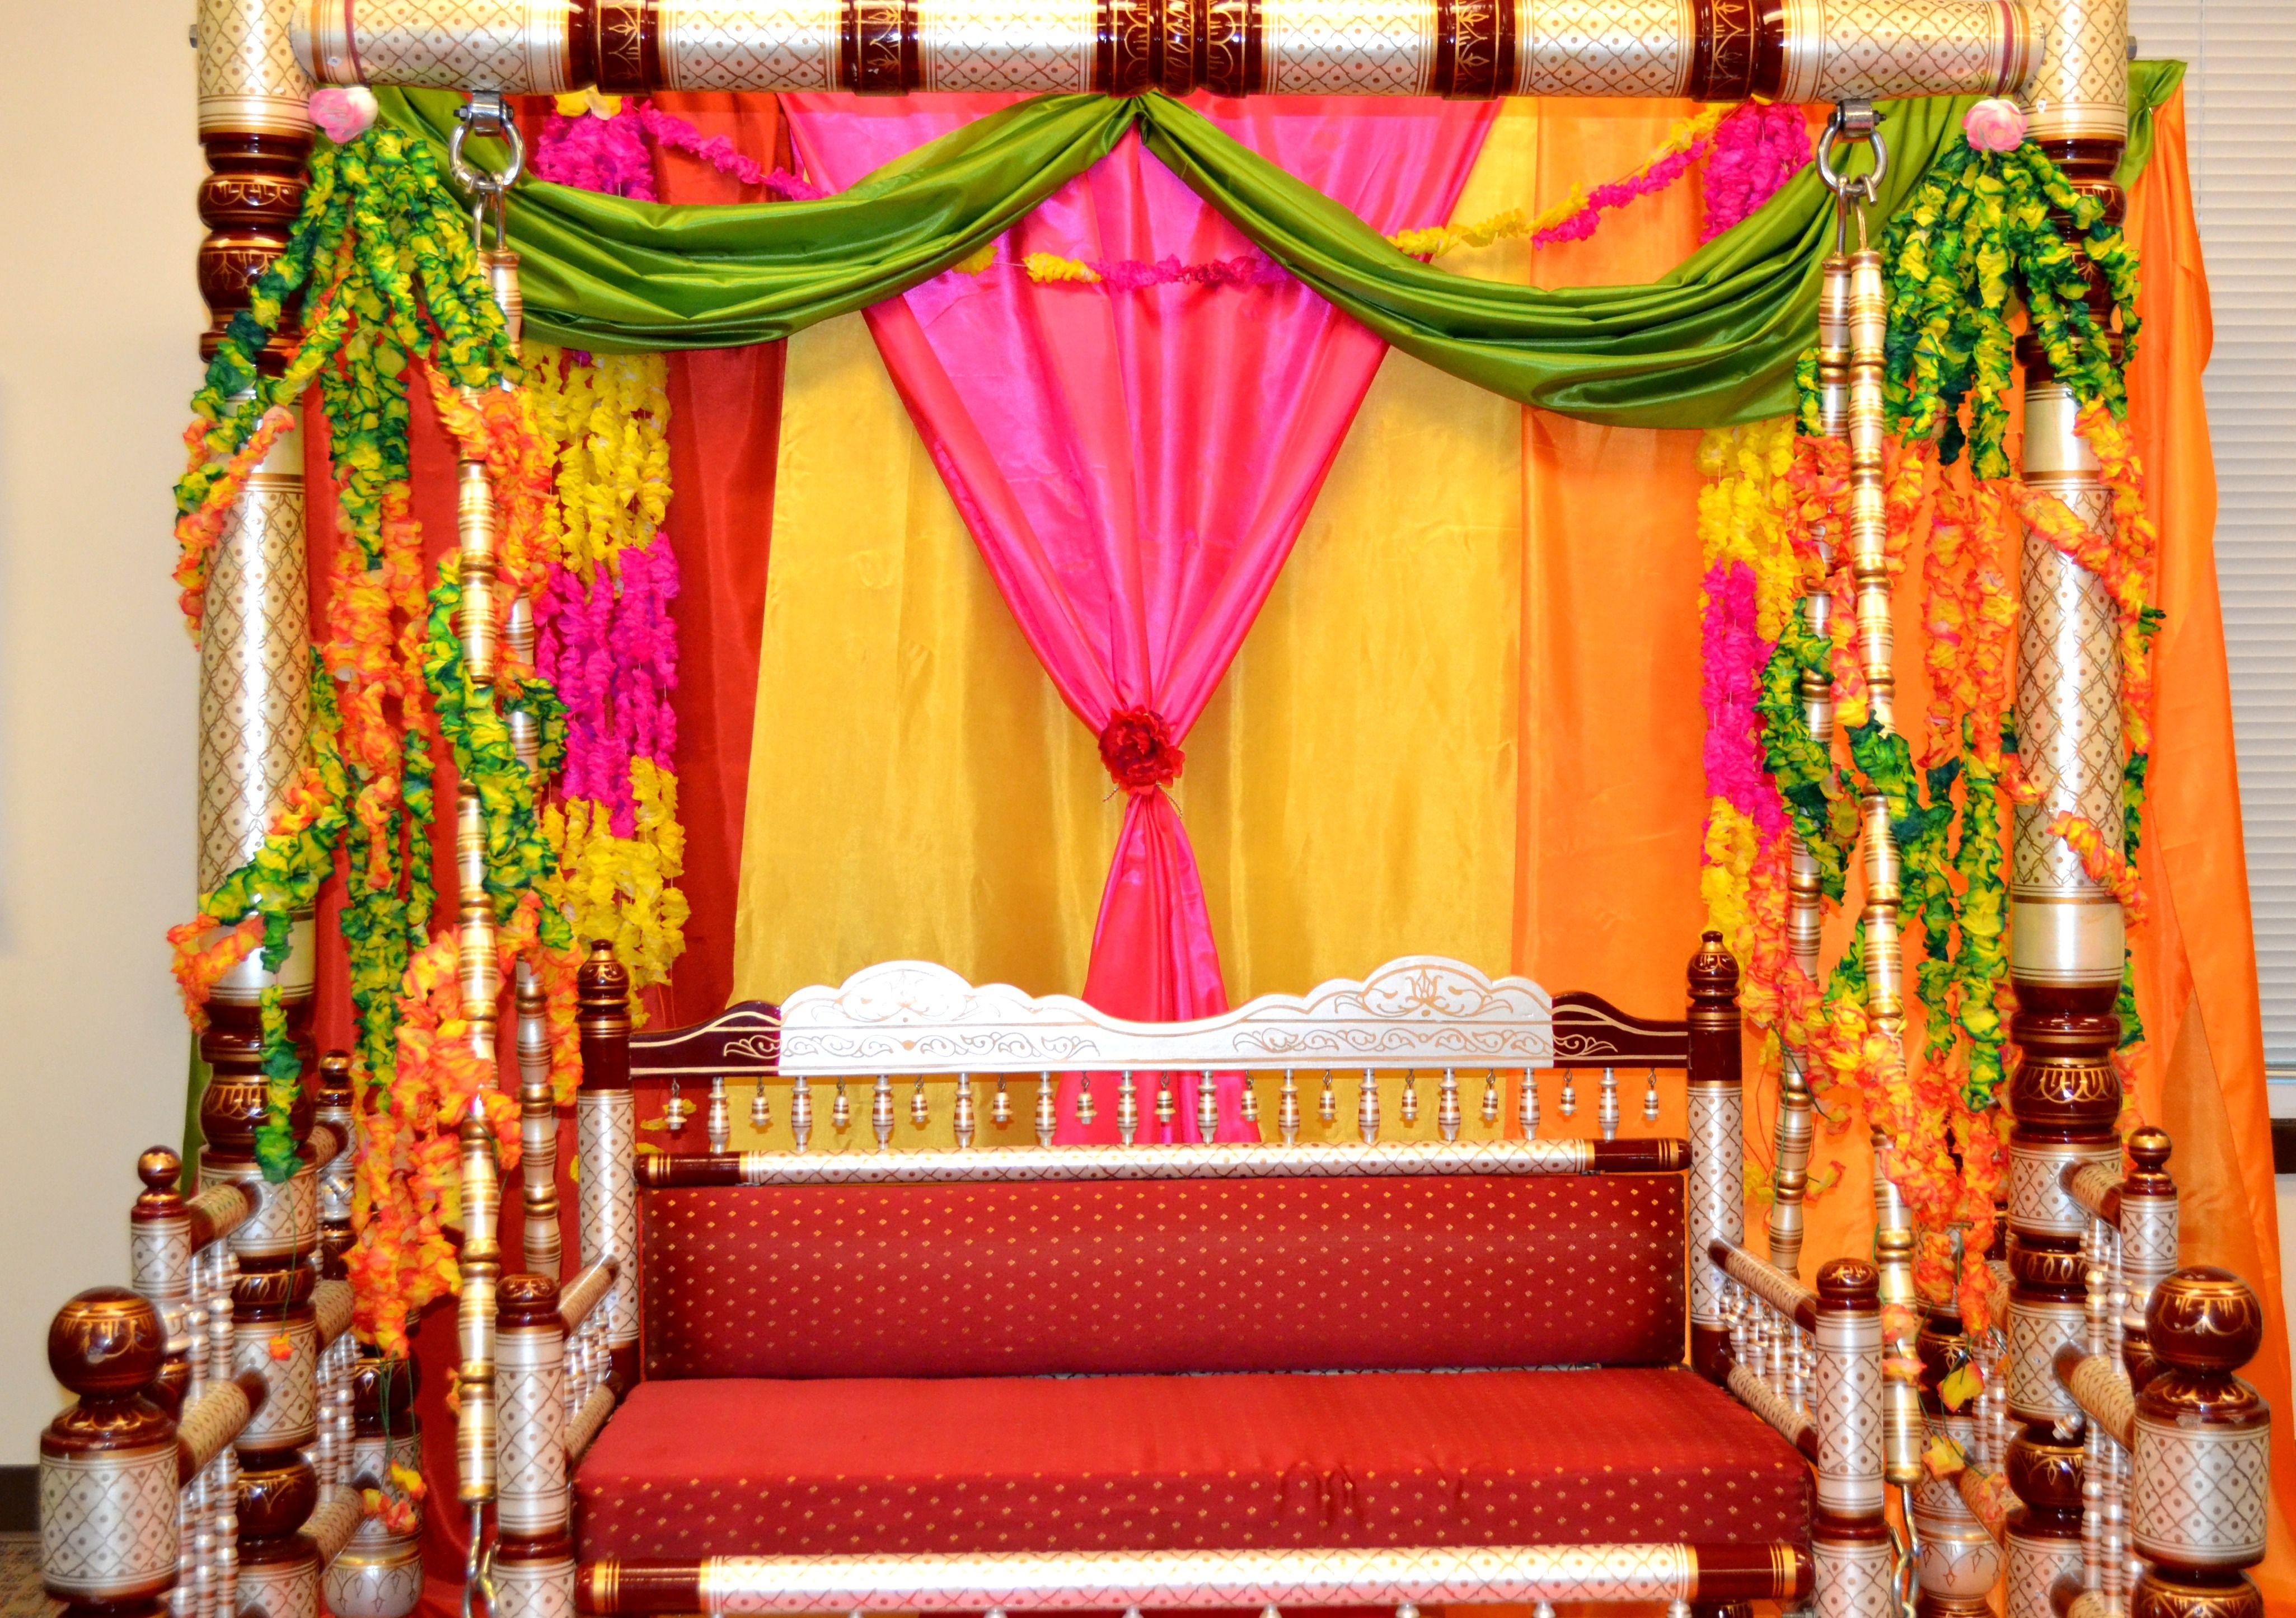 Mehndi Jhoola Mehndi decor, Indian wedding decorations